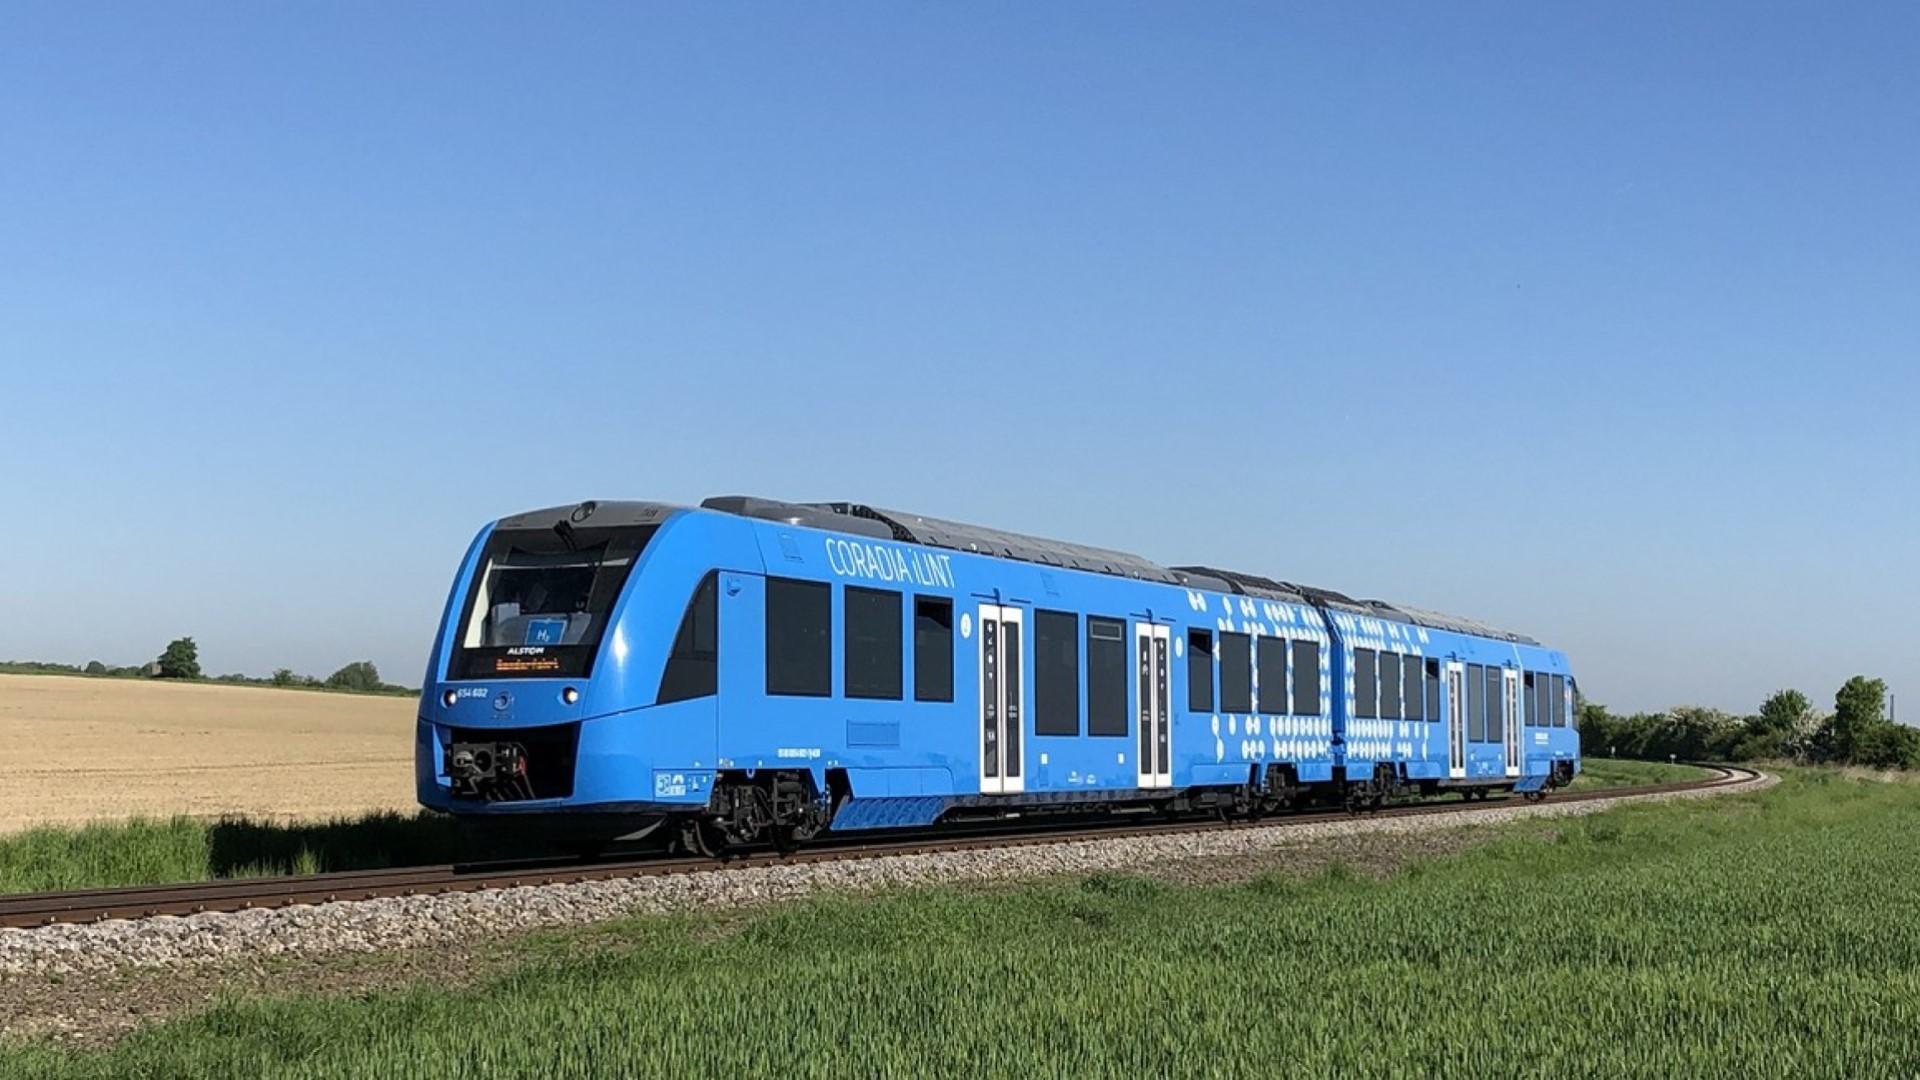 The Coradia iLint is the world's first hydrogen-powered train. According to Antonio Moreno, Poland can expect its first hydrogen train in the near future.